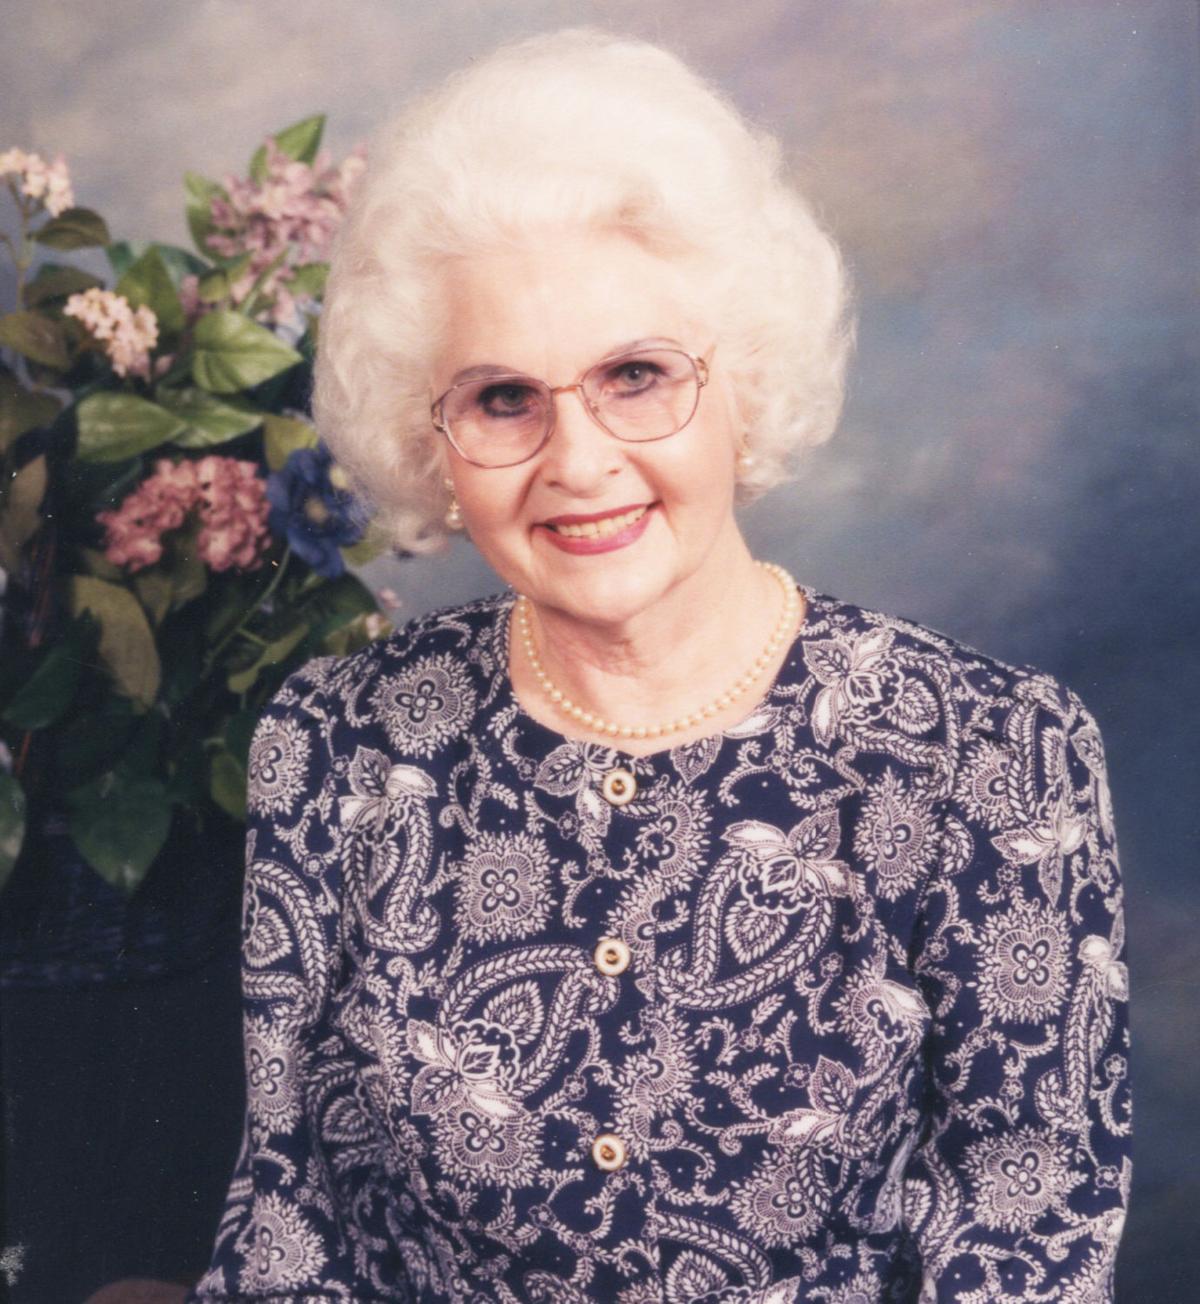 Daphne Tresher